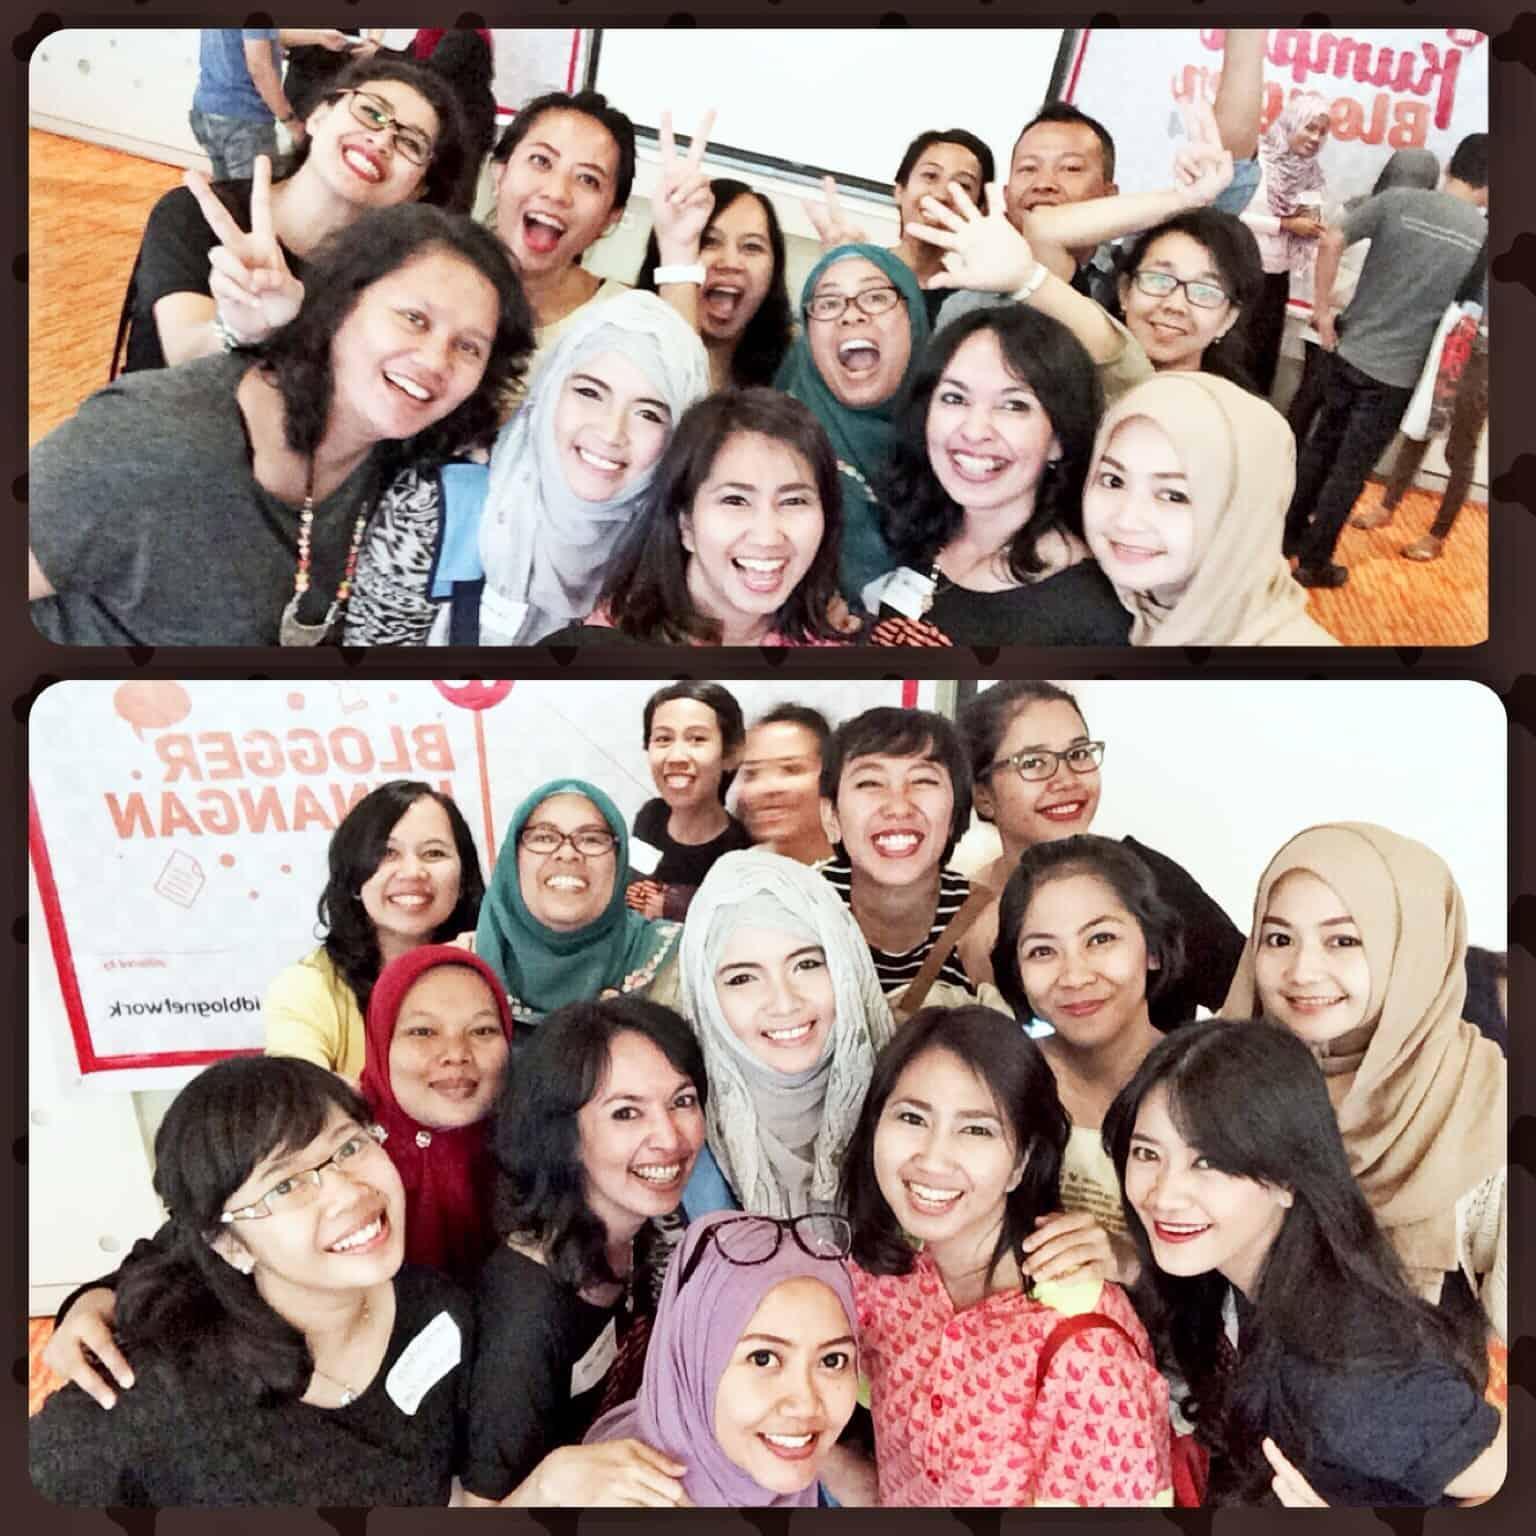 With Indah, Eny , Mira Sahid, Ollie, Ceritaeka, Thia, Irma, Wiwik, -Ainun- and Leonita-1